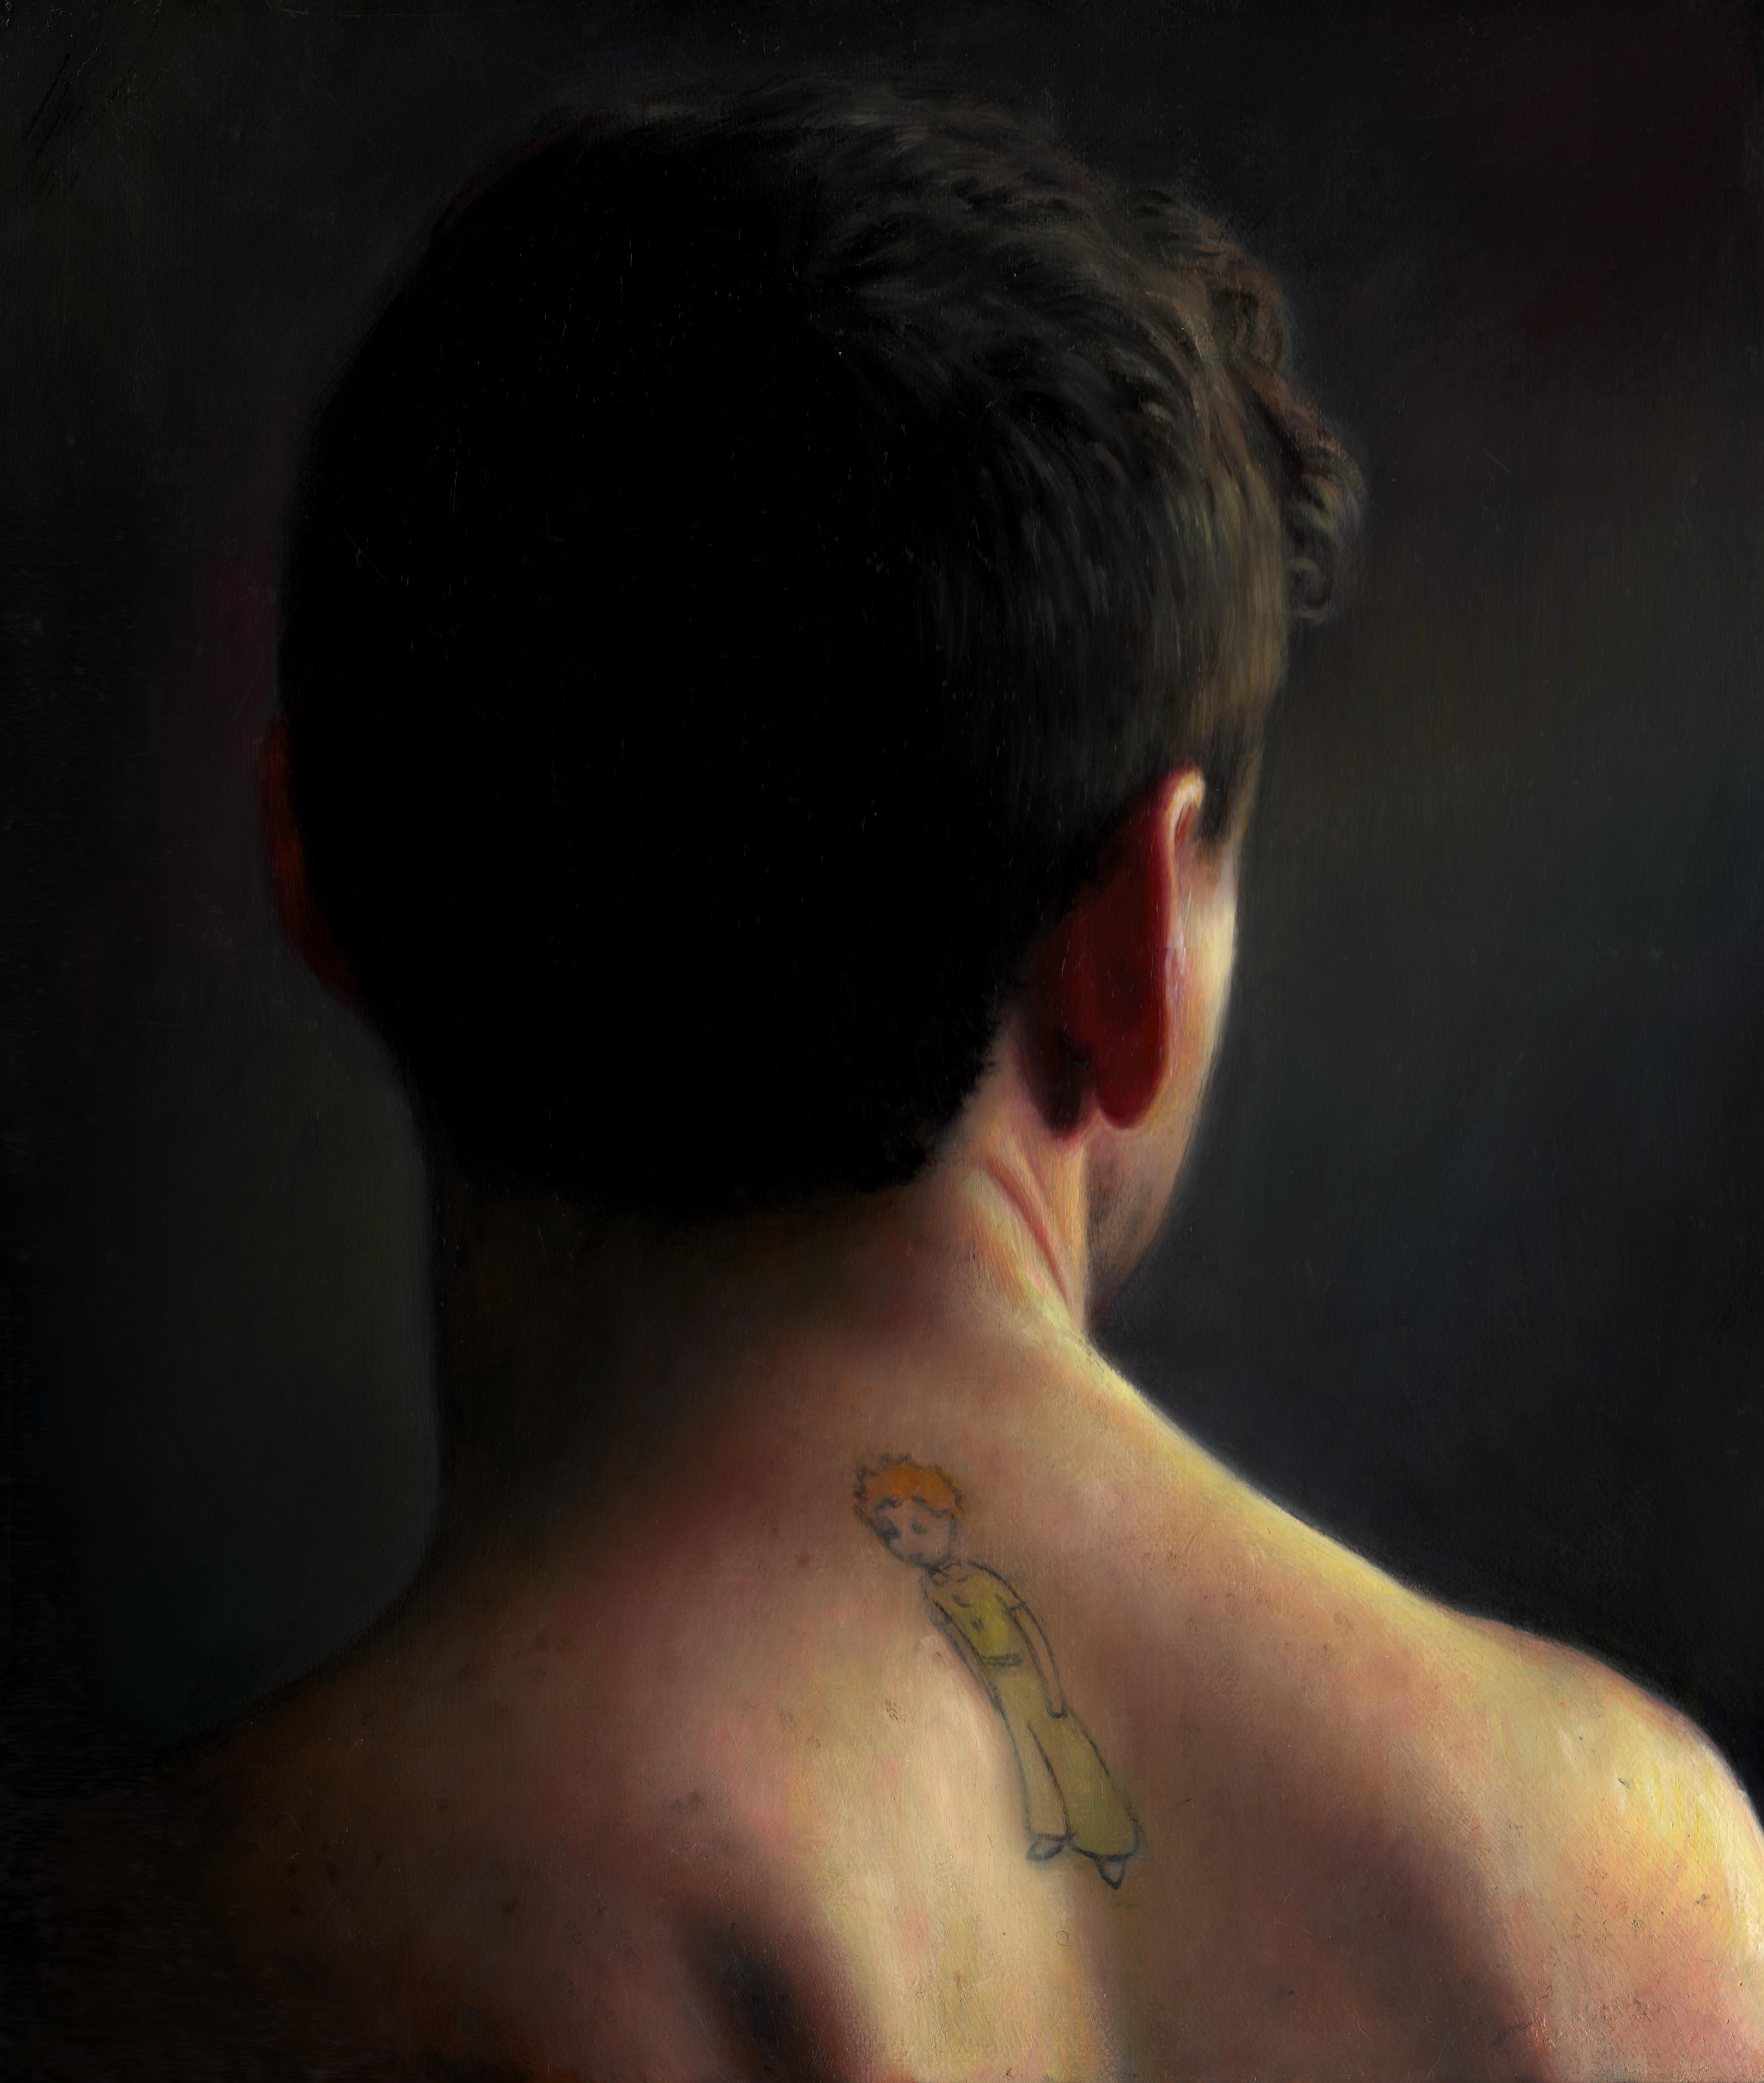 TM Davy, 'Back of Neck' Courtesy the artist